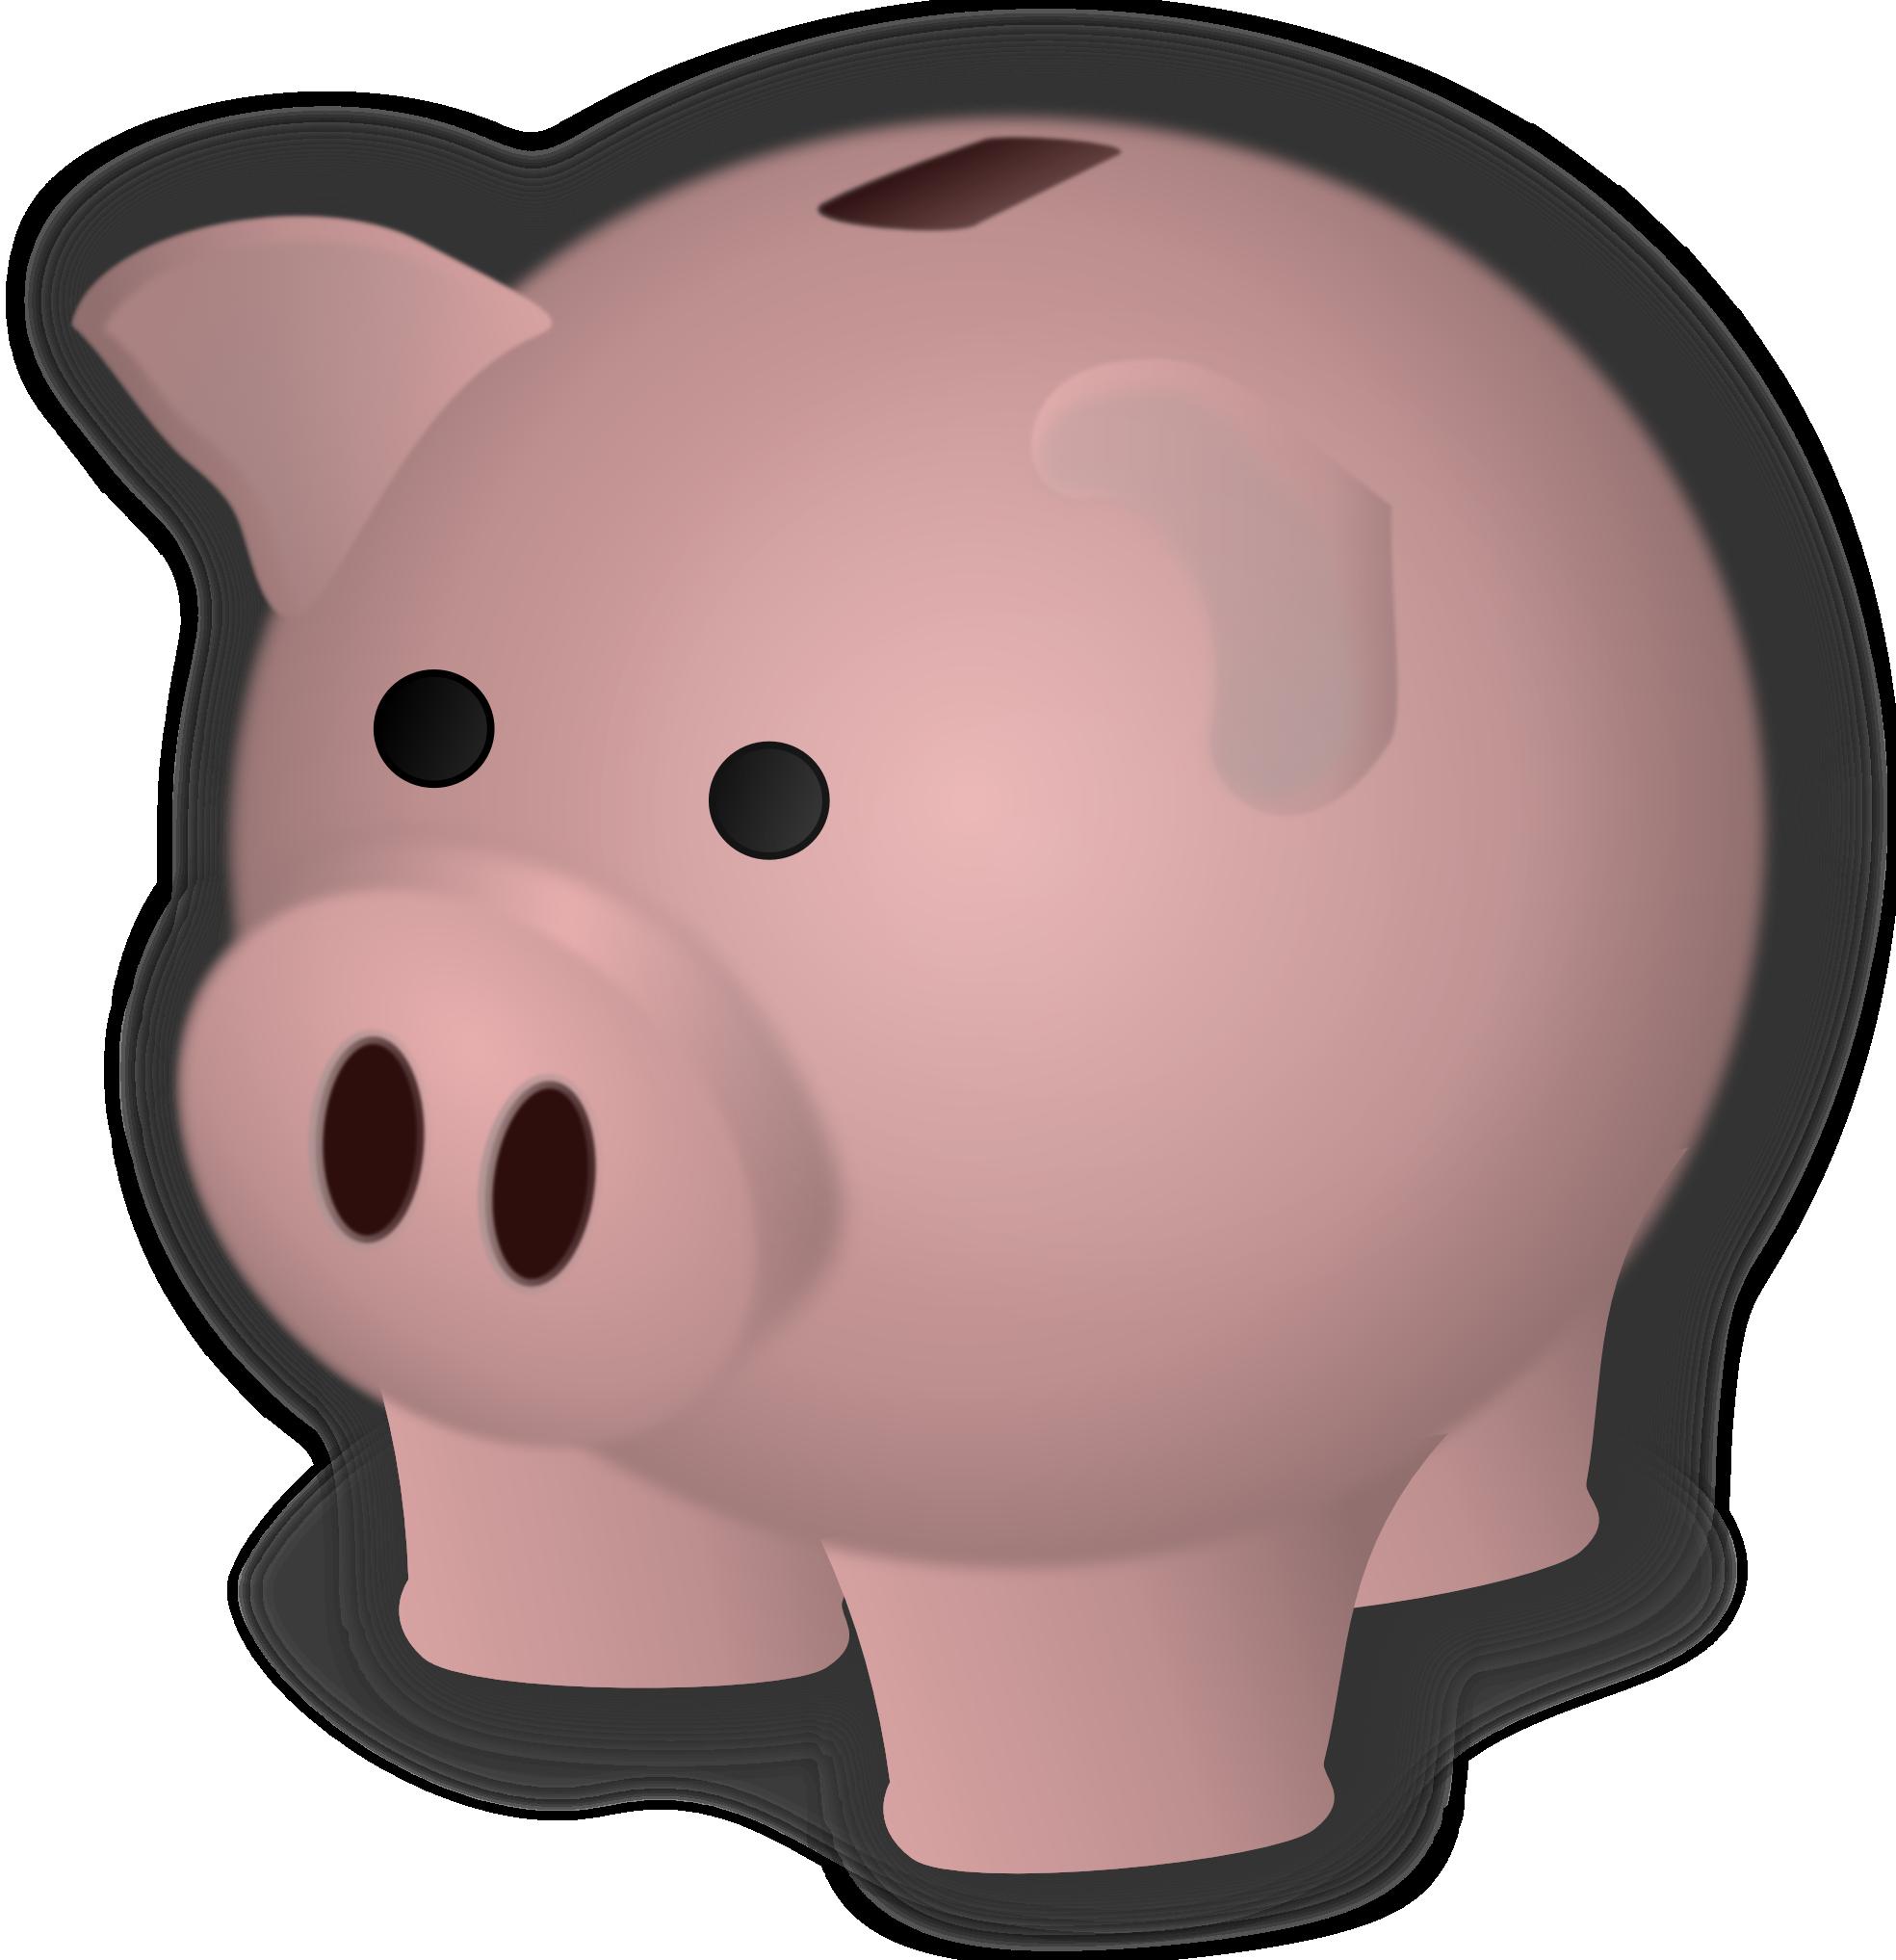 Piggy Bank Clip Art Clipart 4-Piggy bank clip art clipart 4-10